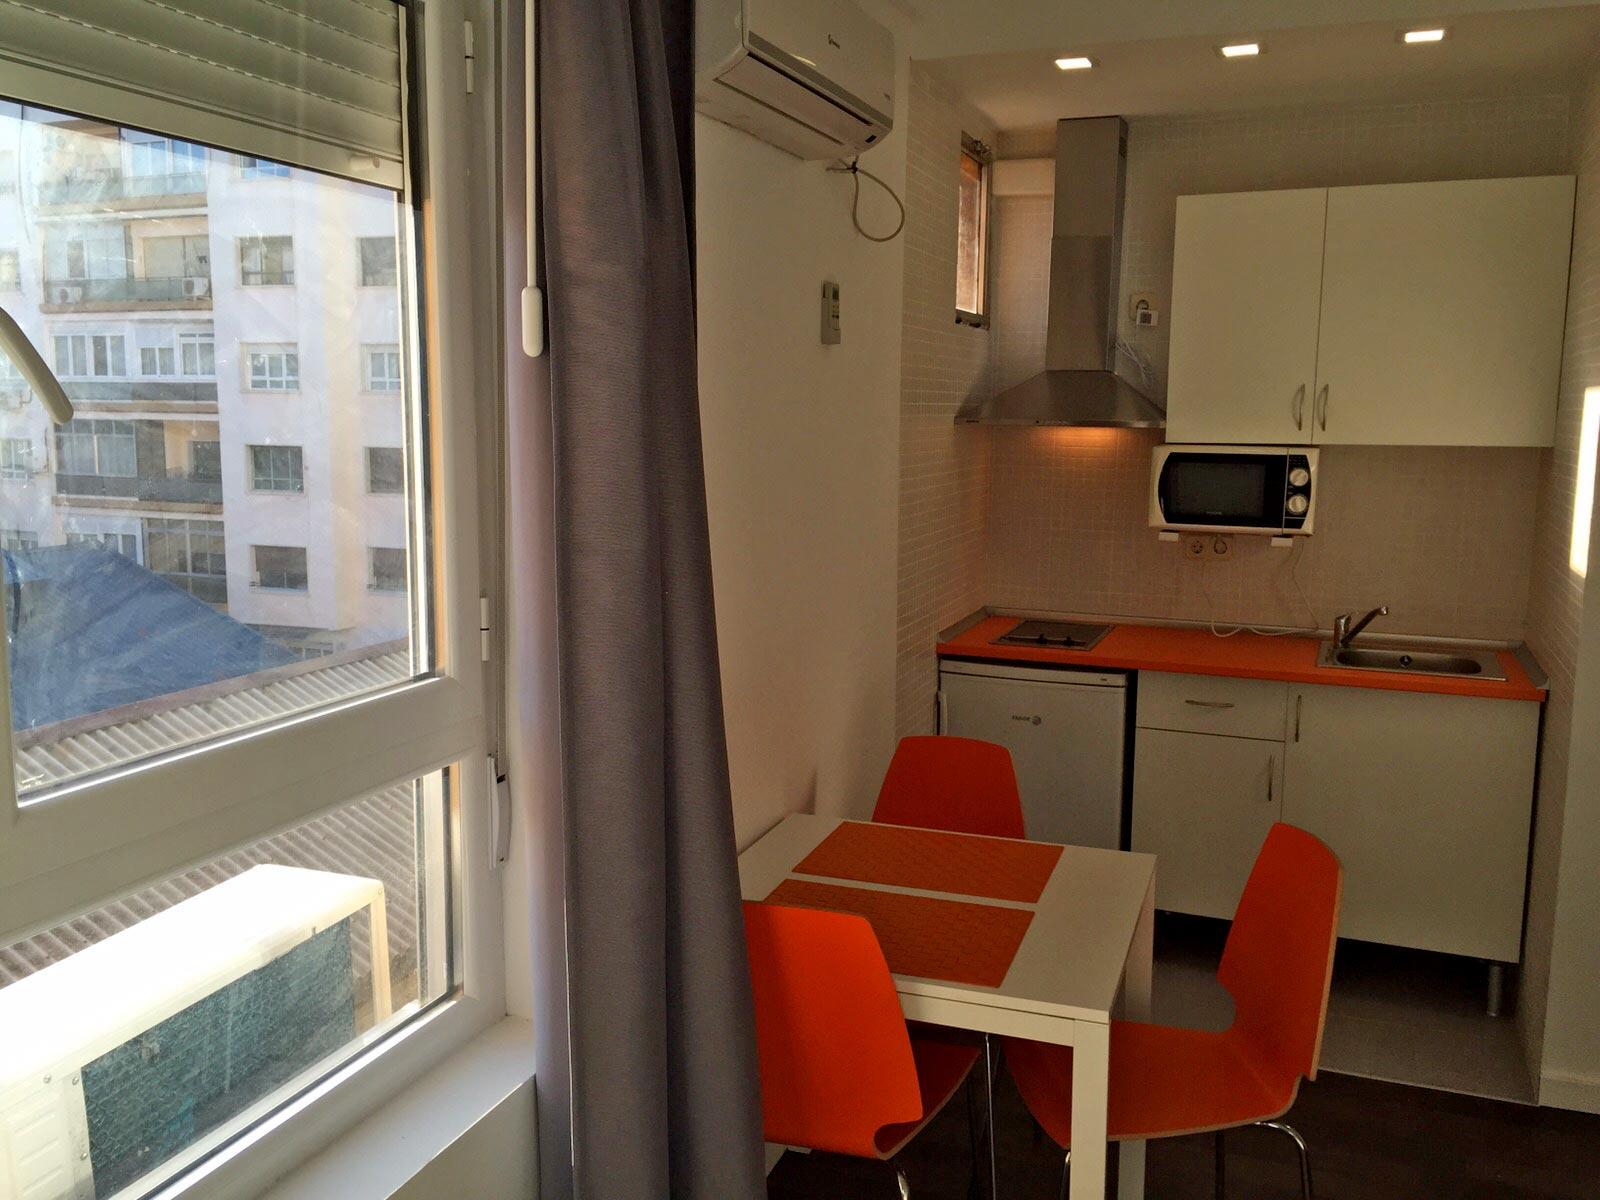 Galileo apartamentos galileo alquiler de apartamentos por meses madrid espa a - Alquiler por meses madrid ...